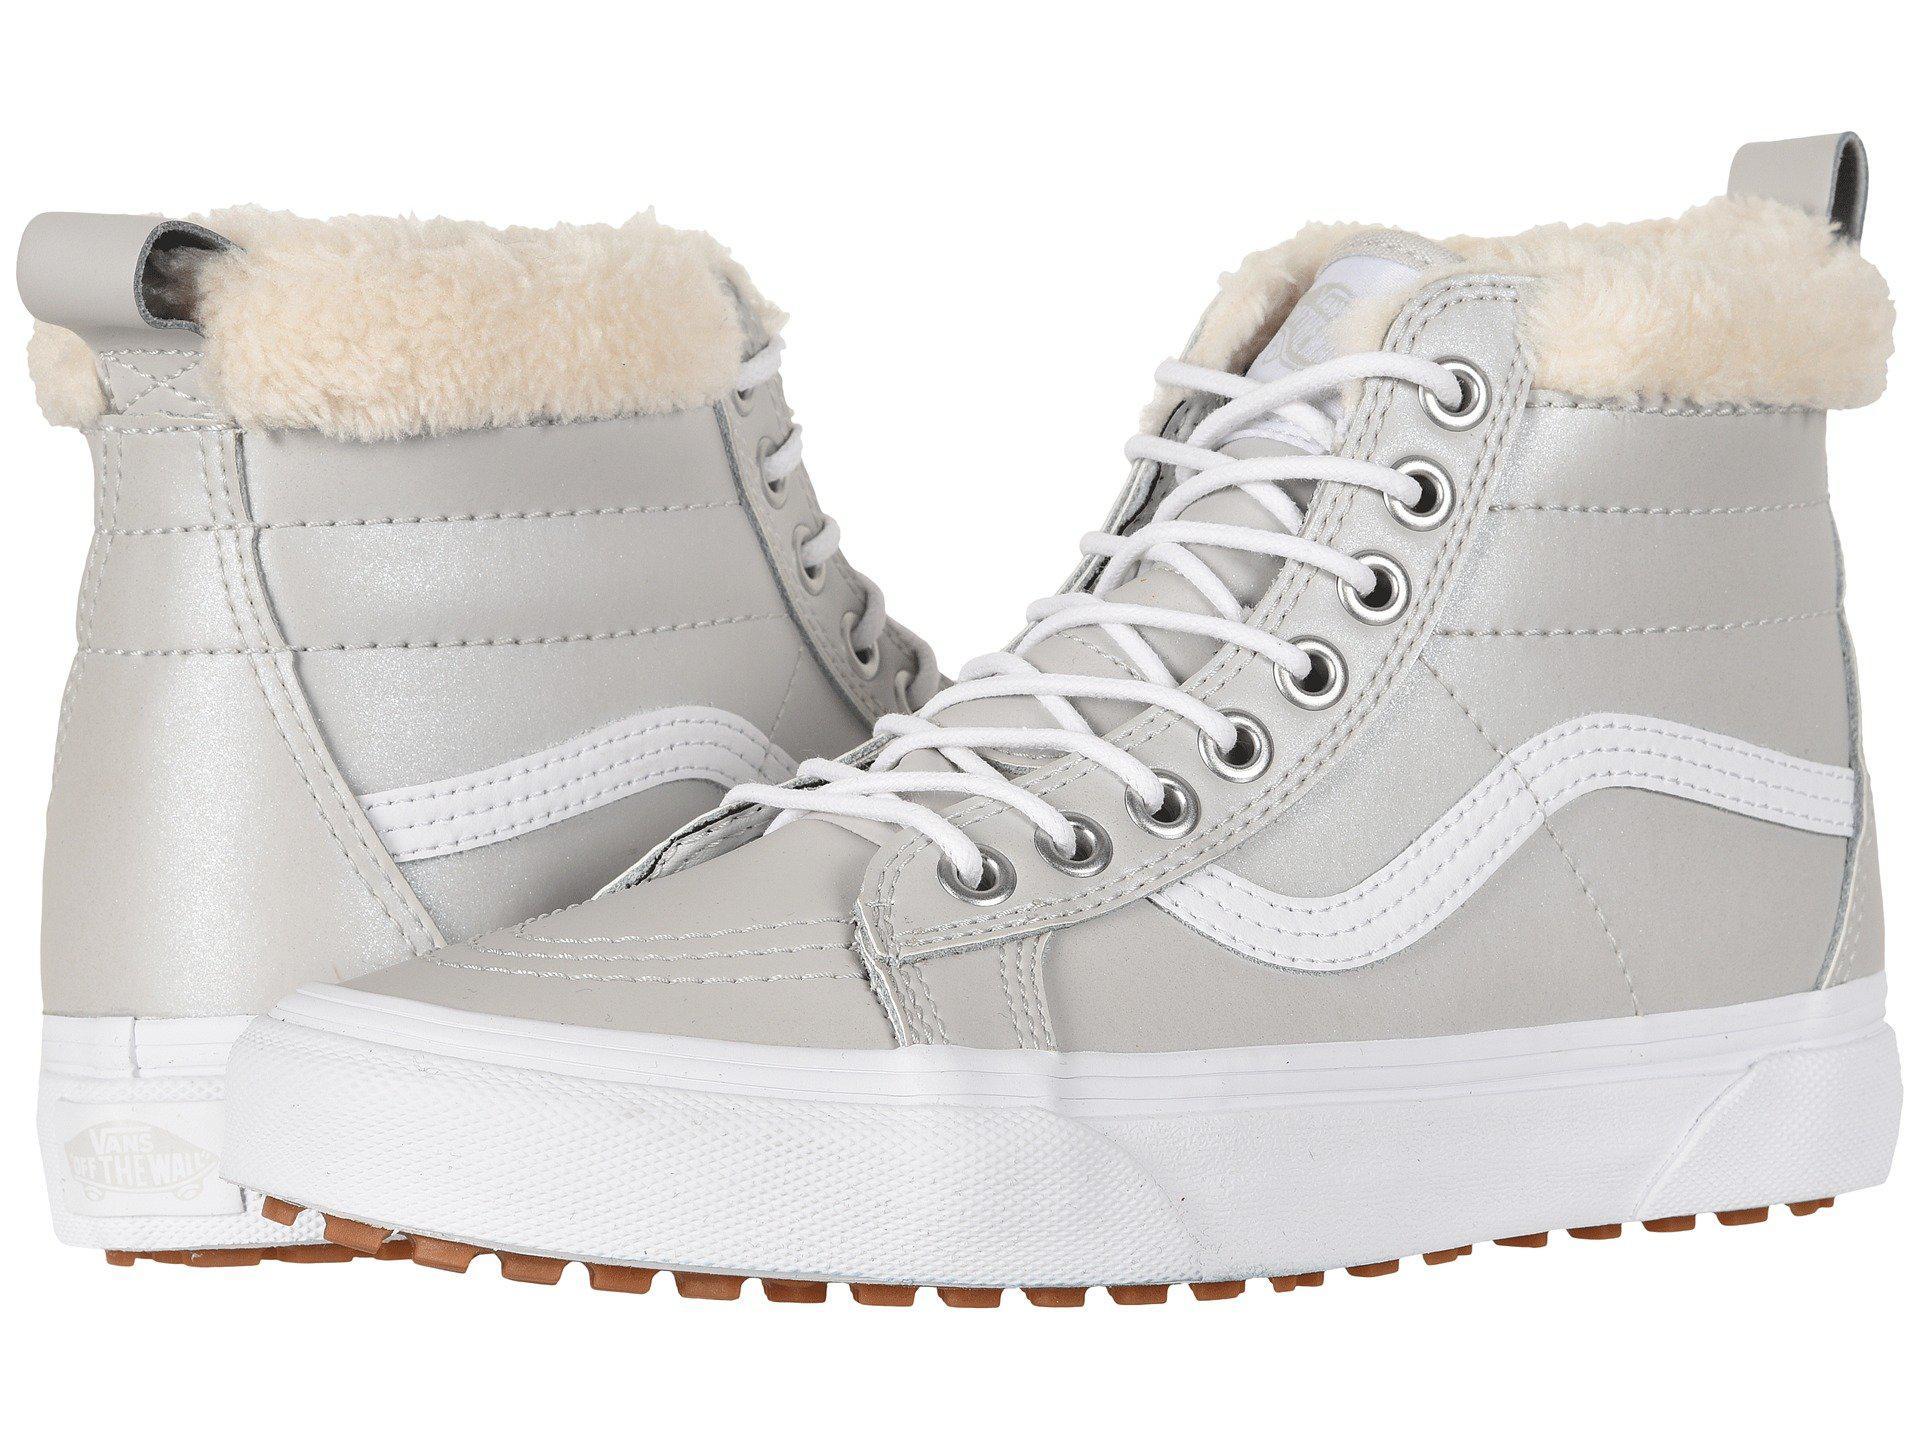 51635370a5 Vans. Women s Metallic Sk8-hi Mte ((mte) Suede chocolate Torte) Skate Shoes